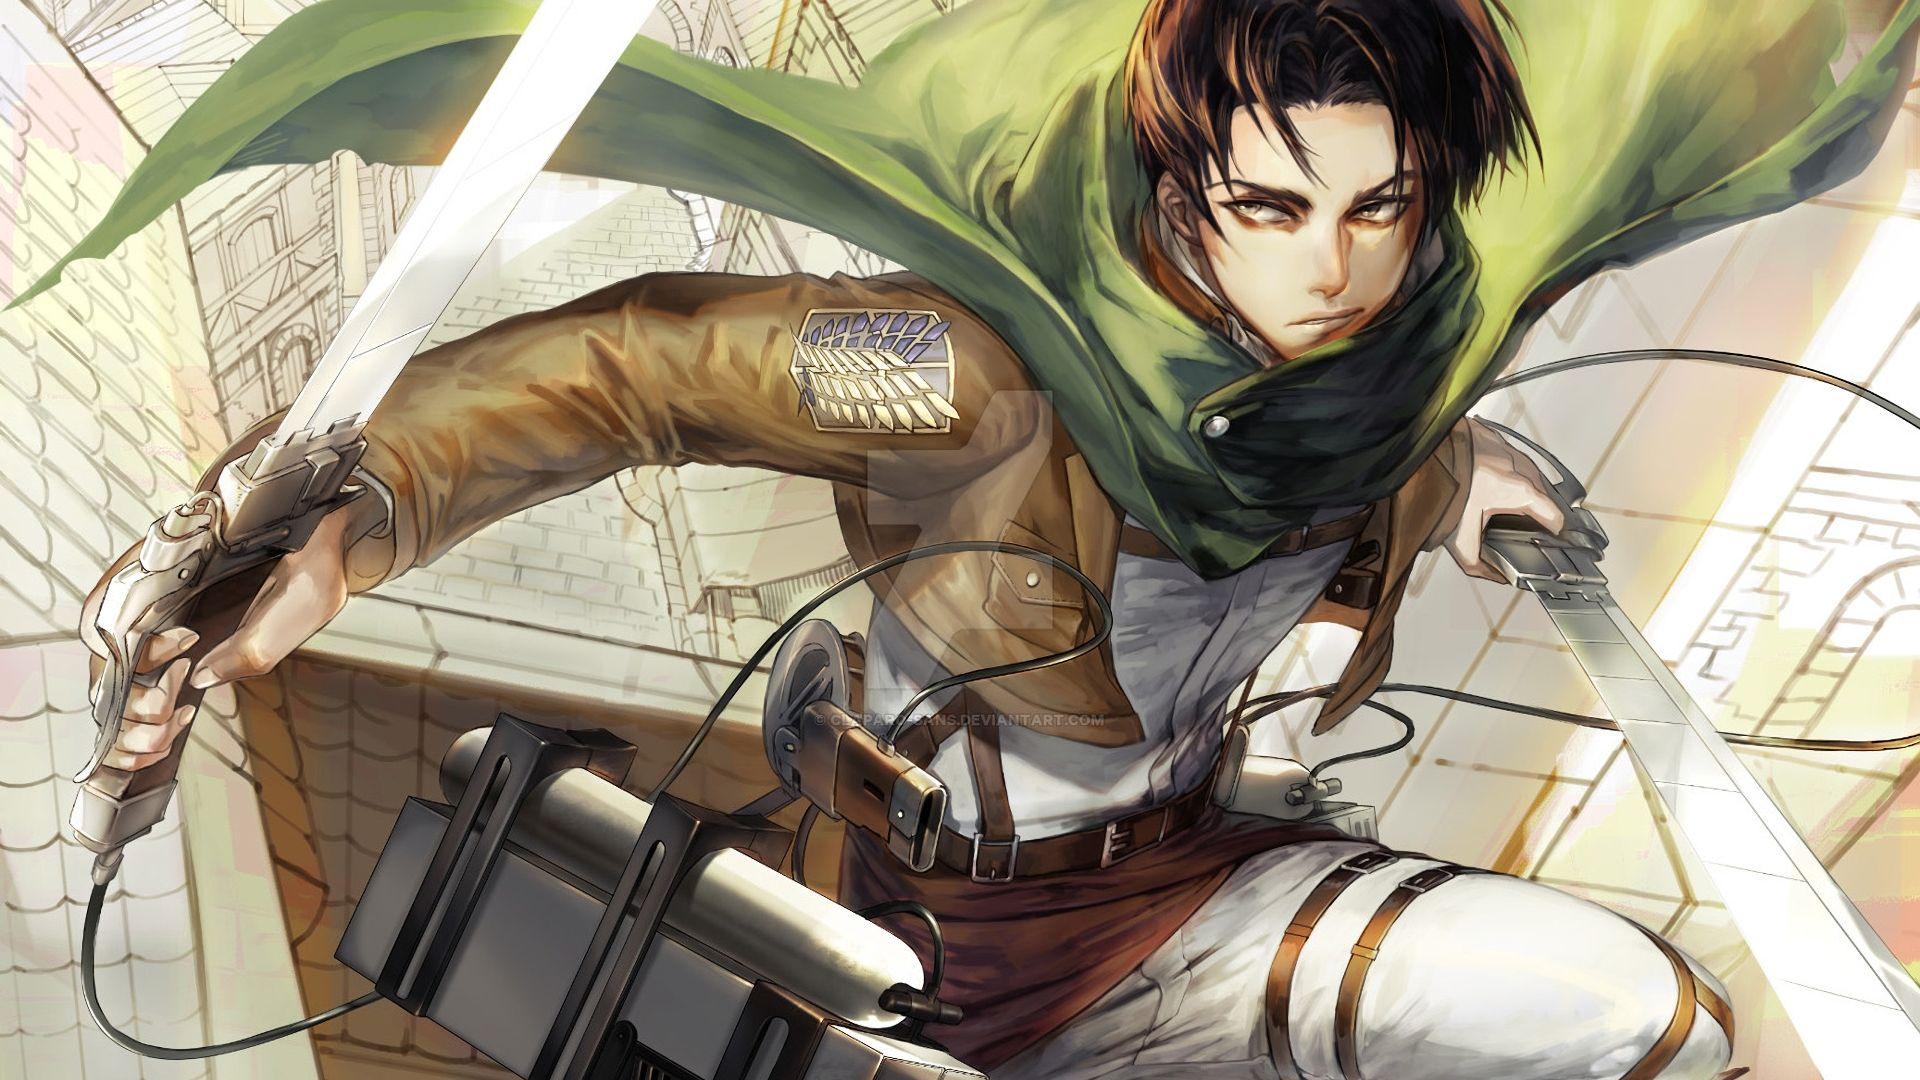 Levi Ackerman, Attack On Titan, Fight, Anime Wallpaper ...